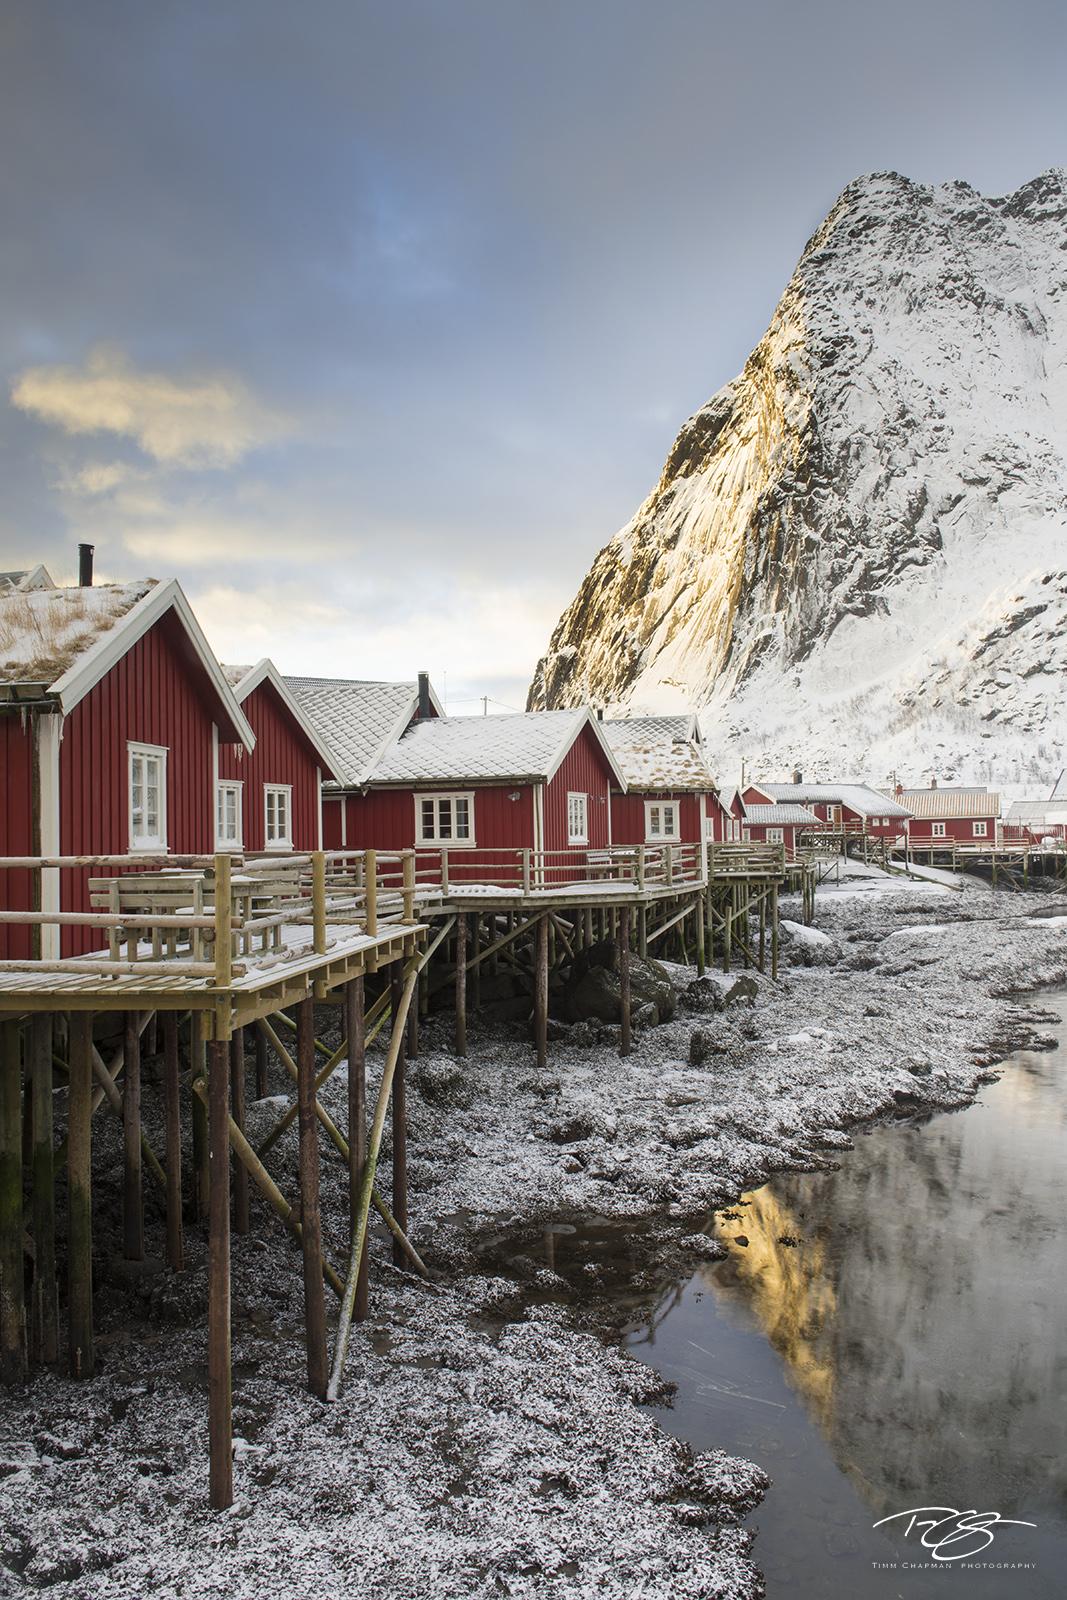 norway, gallery, lofoten, Hamnøy, hamnoy, Hamnøya, Sakrisøya, Sakrisoy, reinebringen, reine, sunrise, warm sun, snowy, fresh snow, alpenglow, selective light, snow, snowing, snowfall, peaceful, quiet, photo